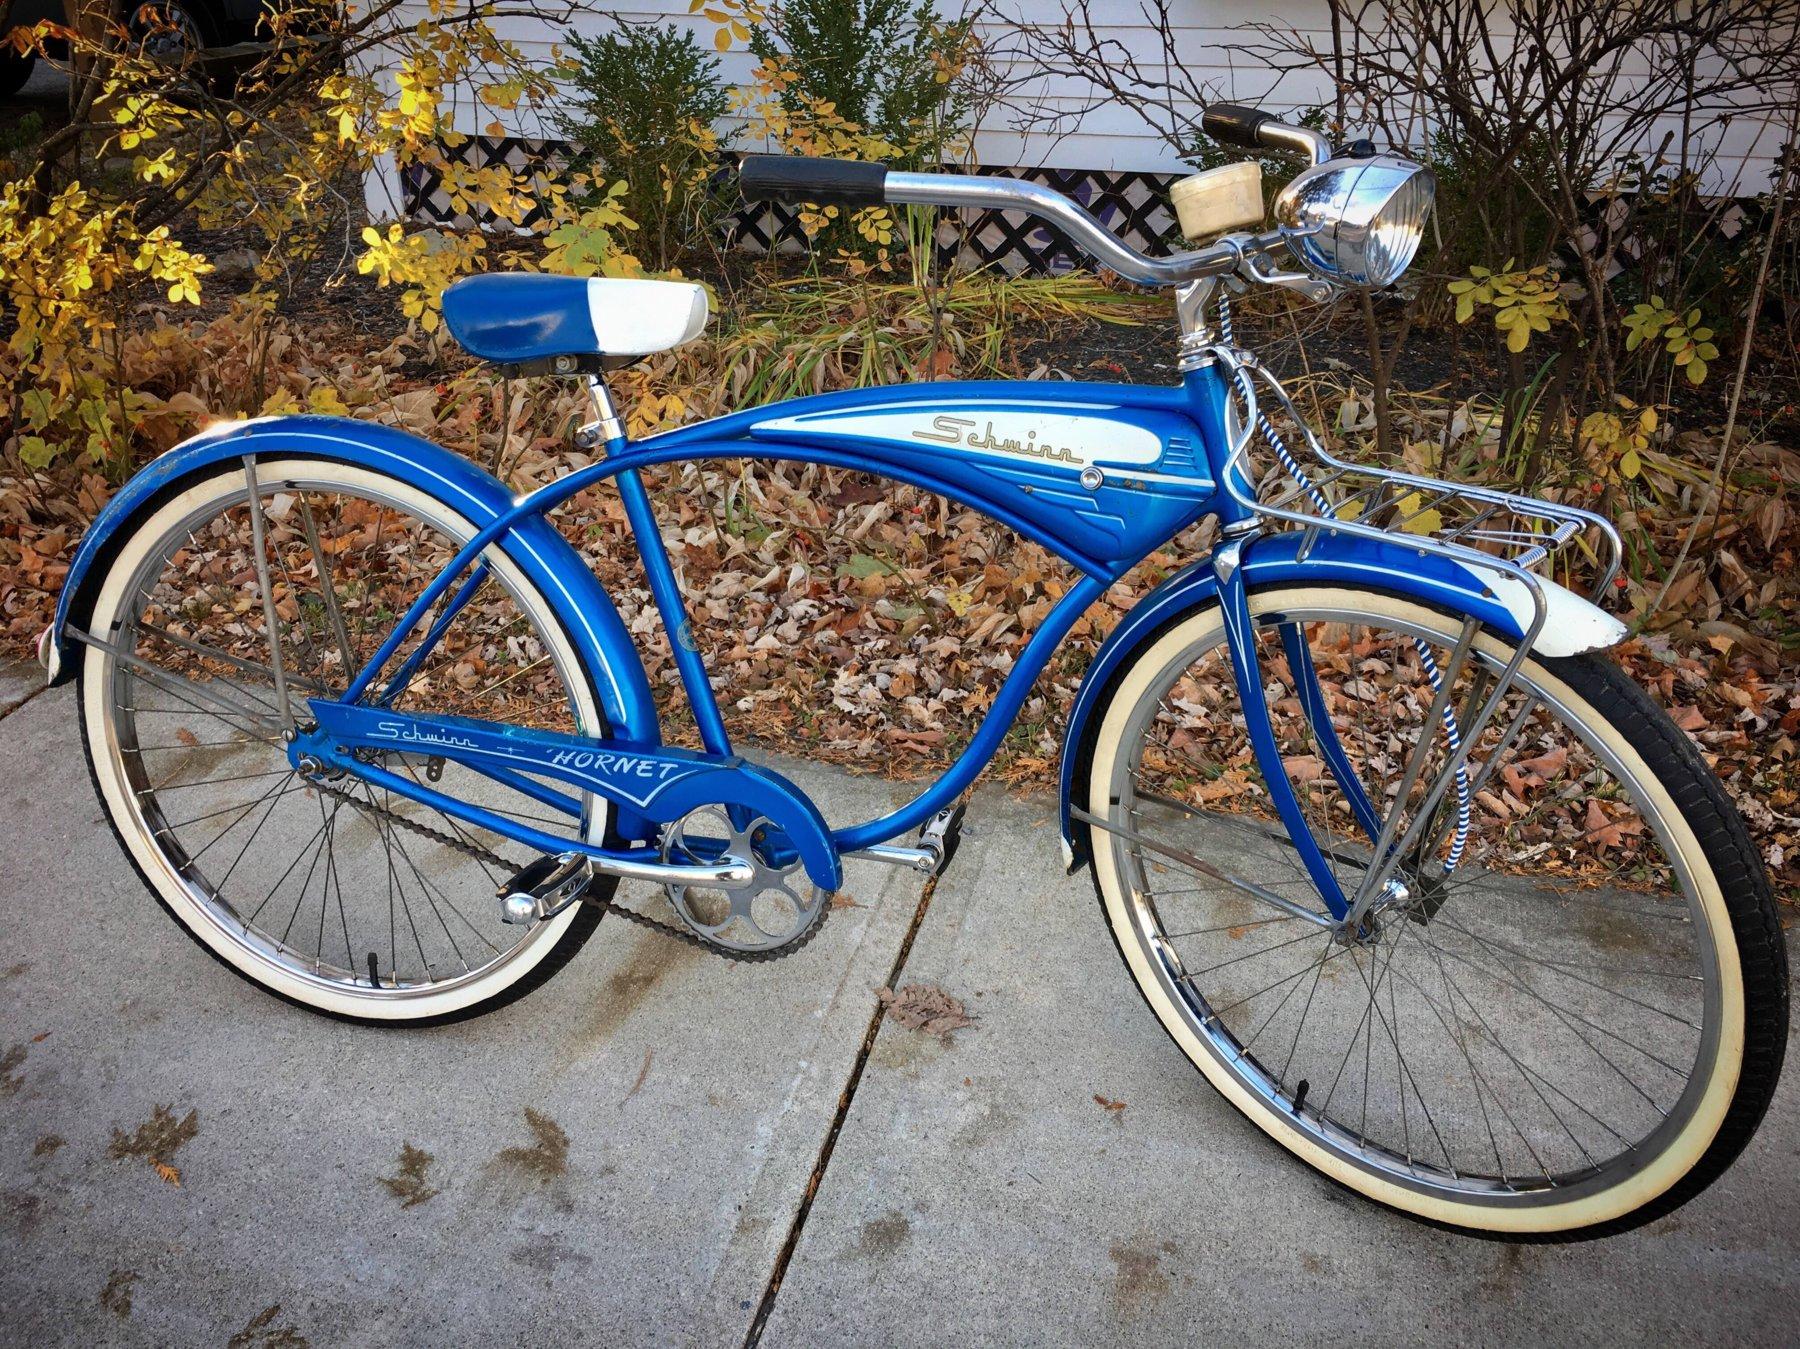 Schwinn Bicycle Painting : Bfgoodrich schwinn hornet barn find the classic